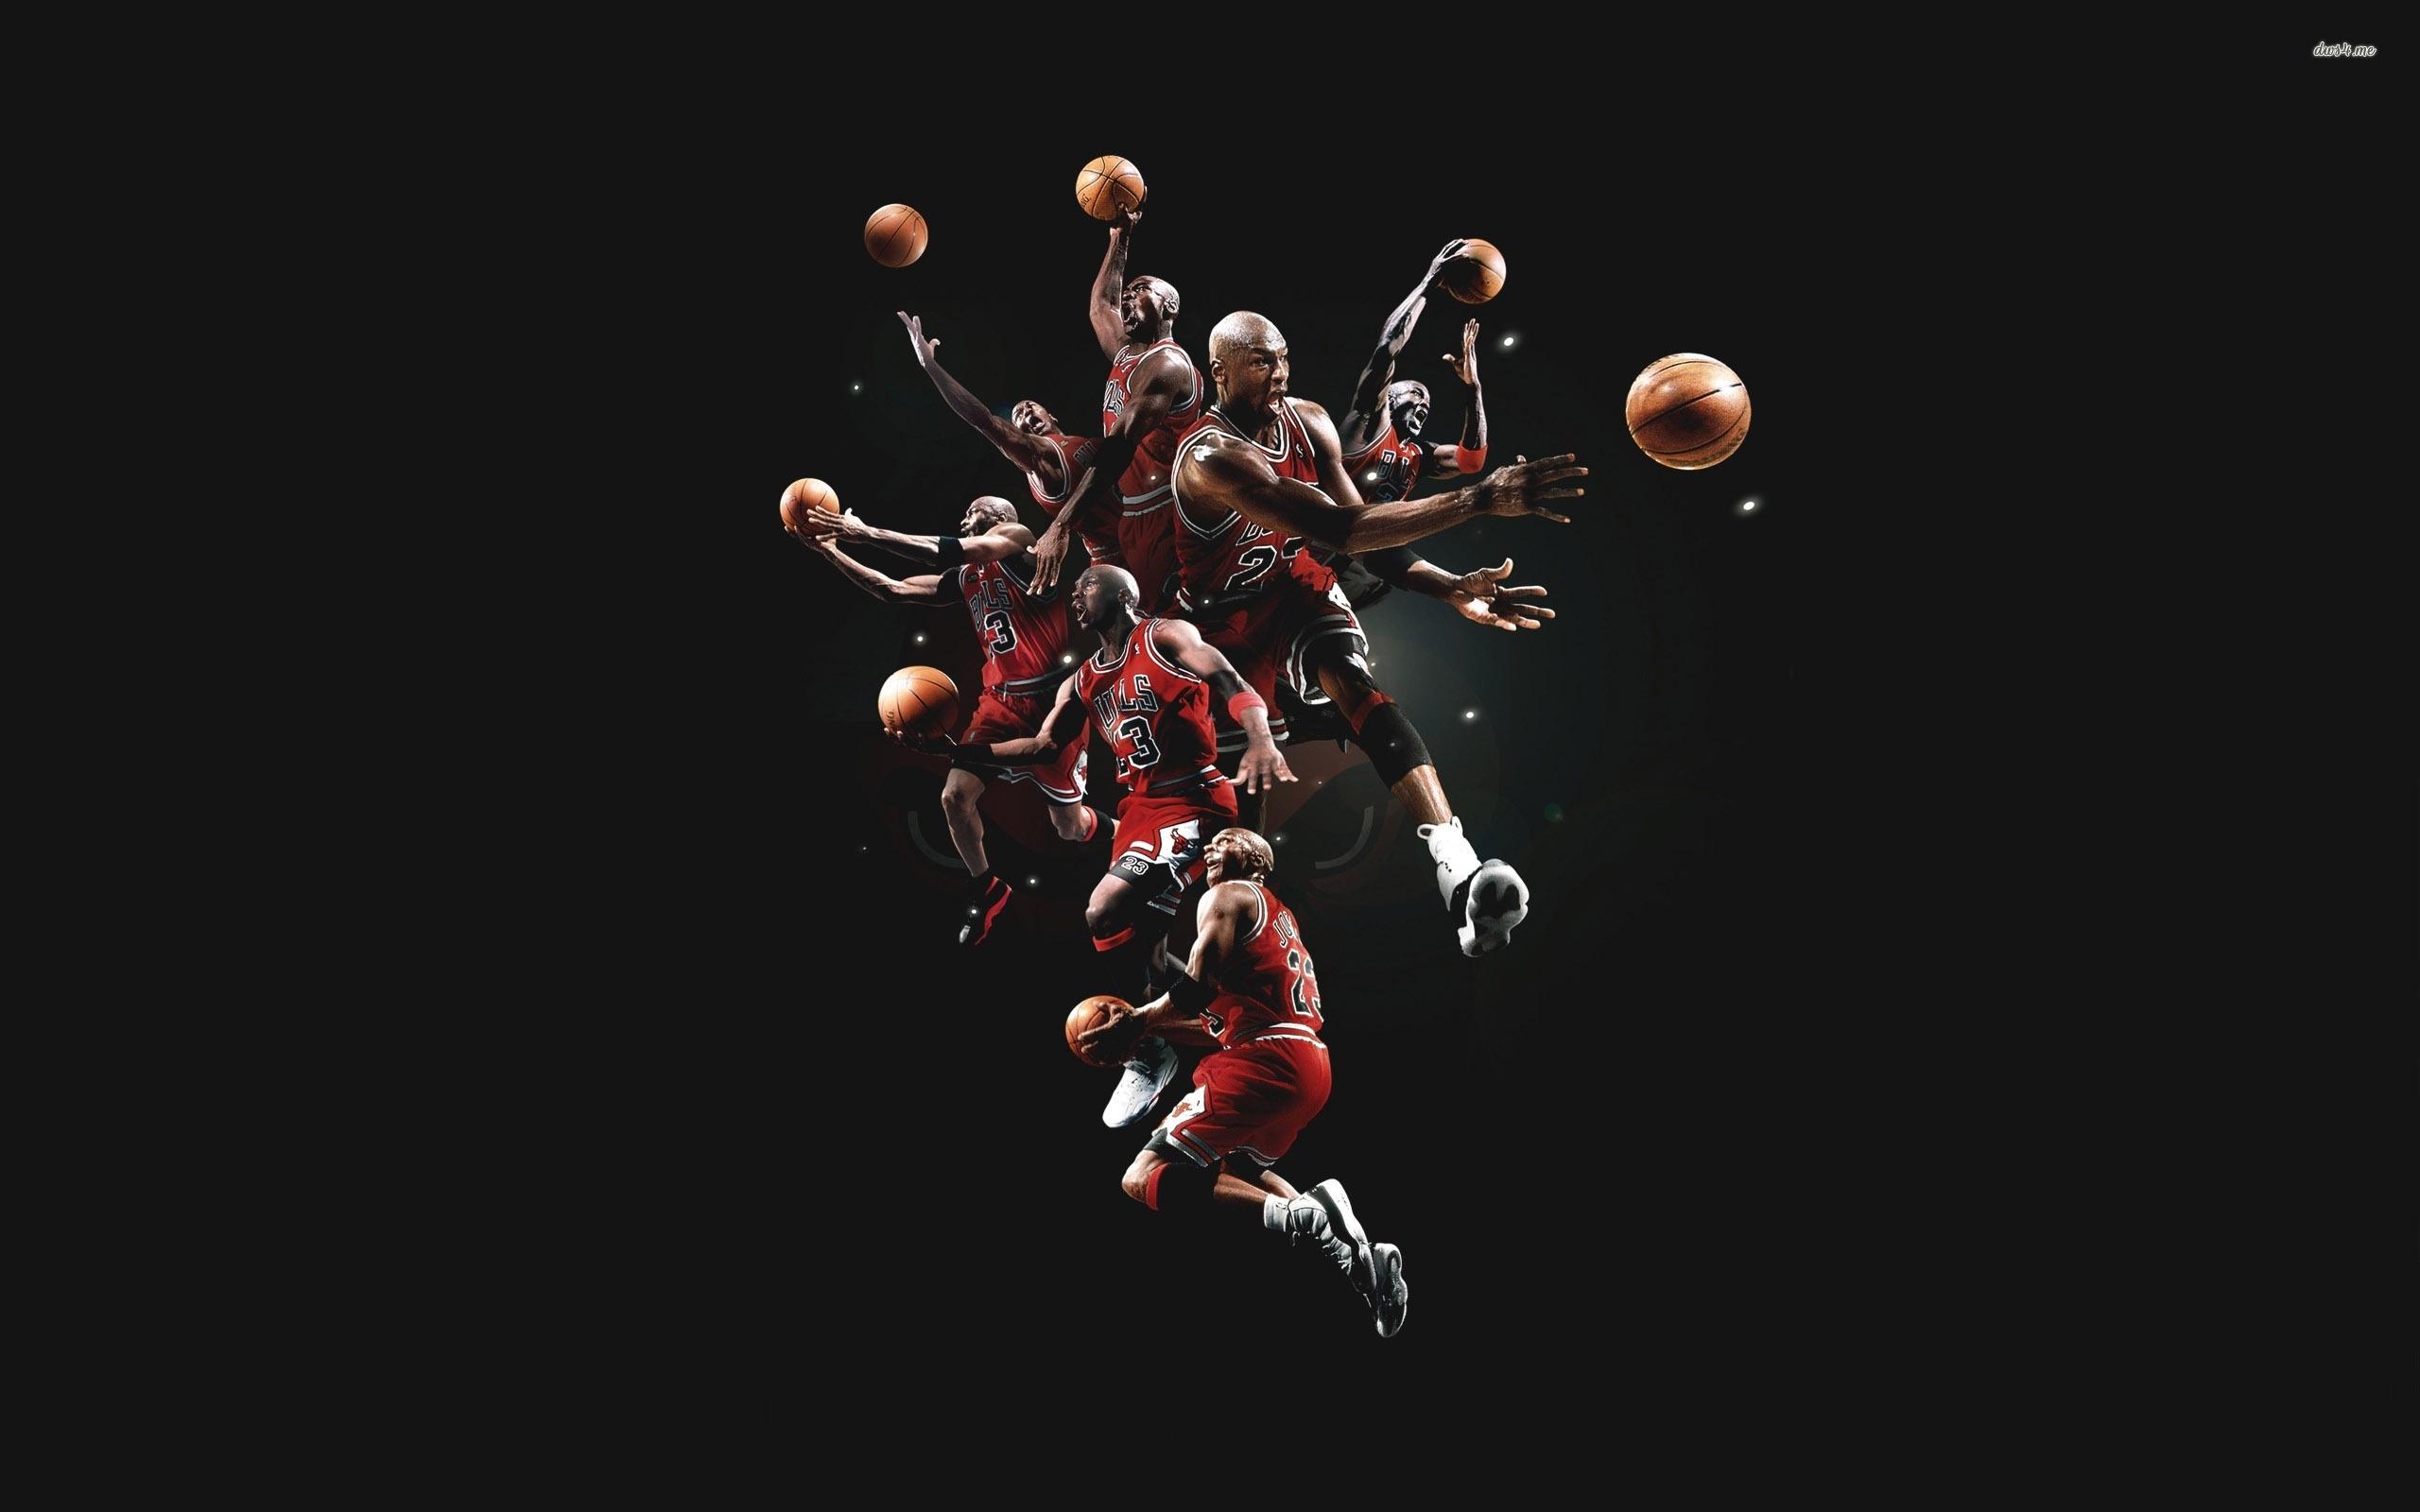 Michael Jordan wallpaper   Sport wallpapers   18450 2560x1600